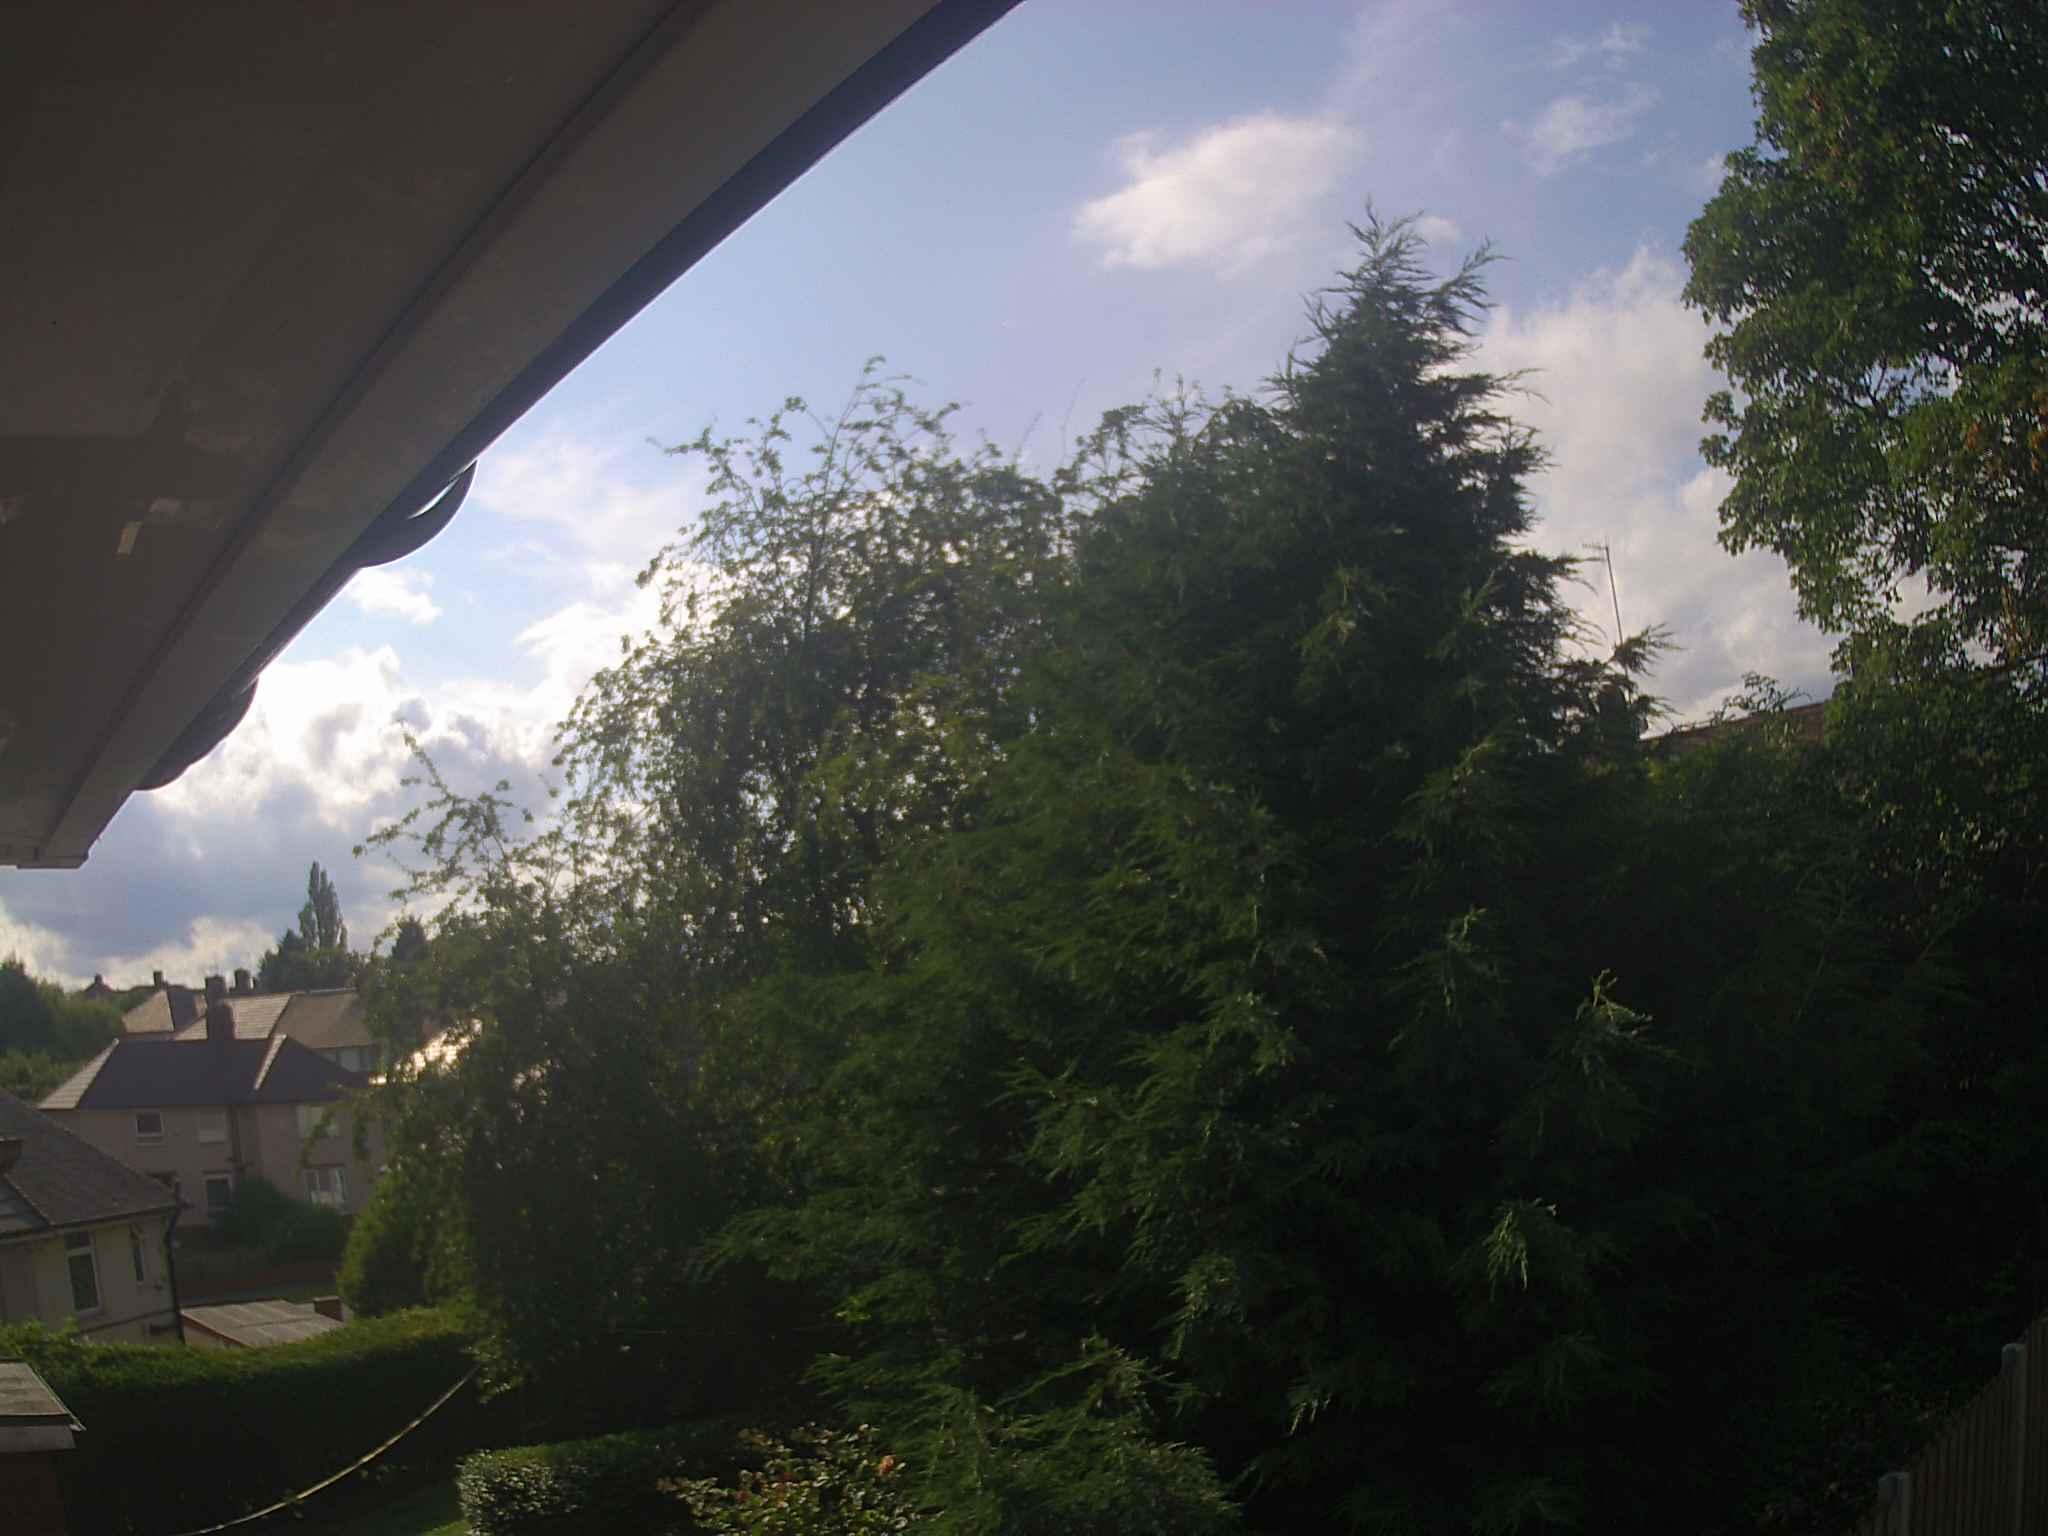 Rear Ipcam Image